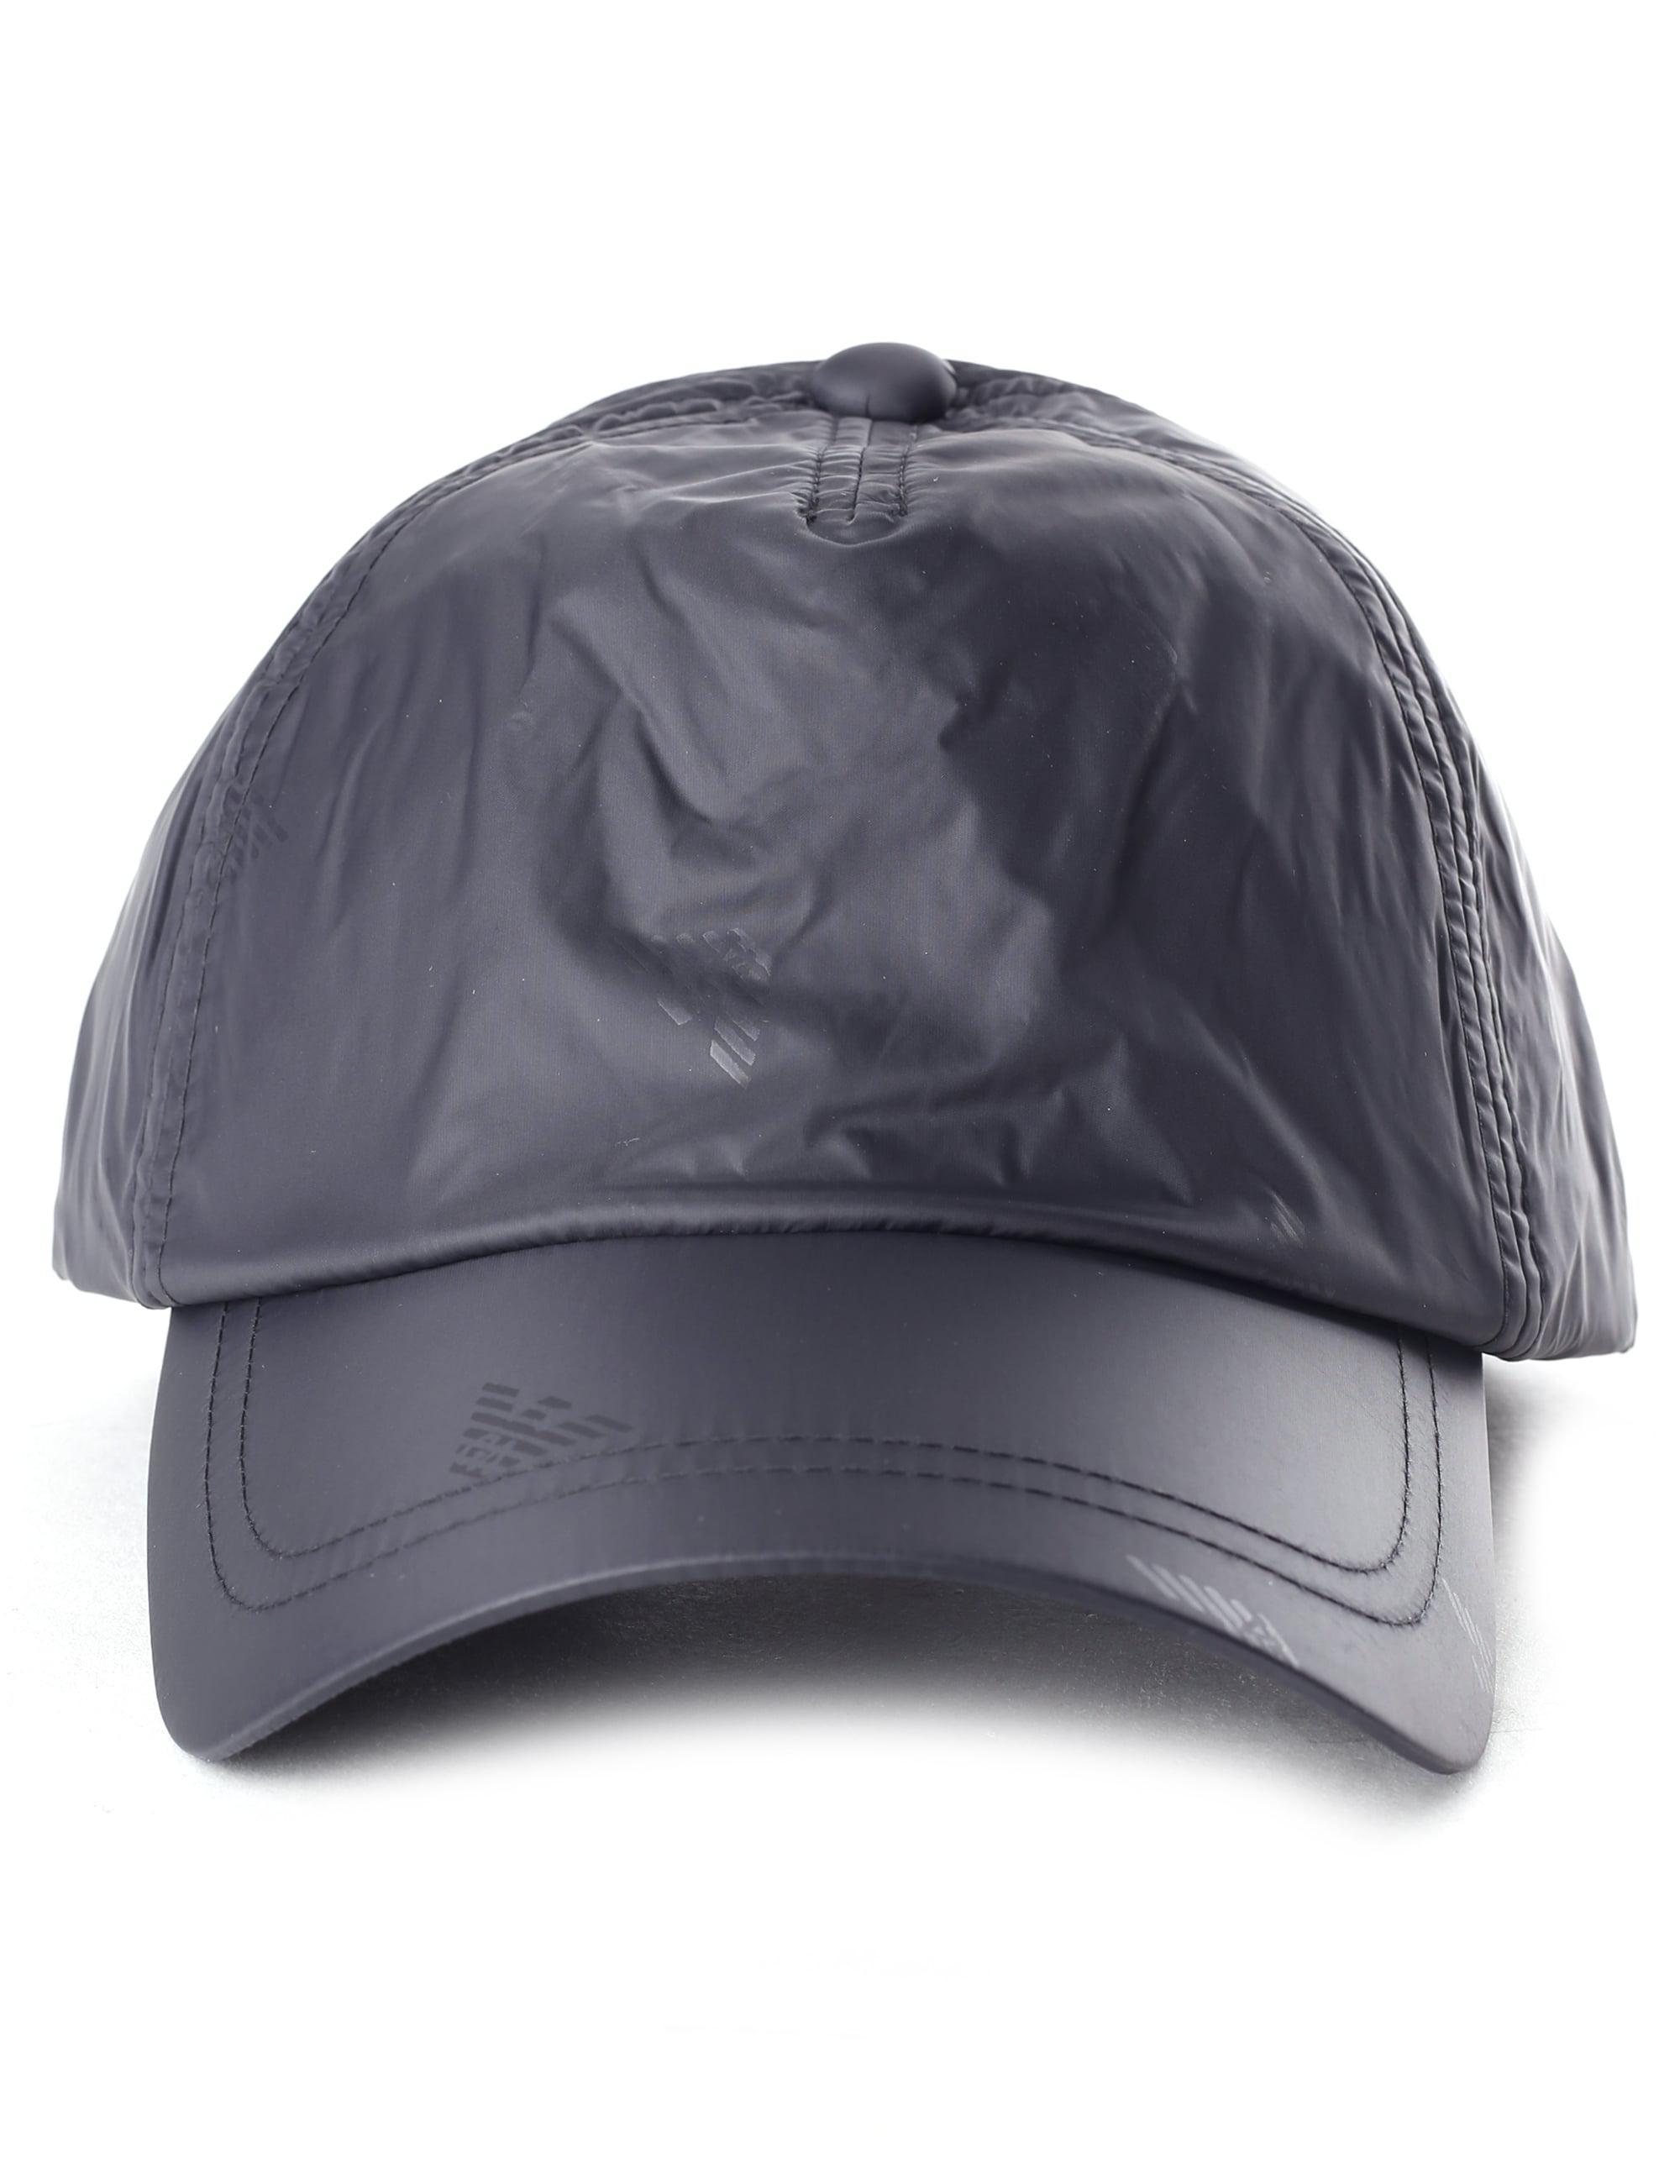 858c65b504b Emporio Armani Men s Repeat Logo Baseball Cap Black in Black for Men ...